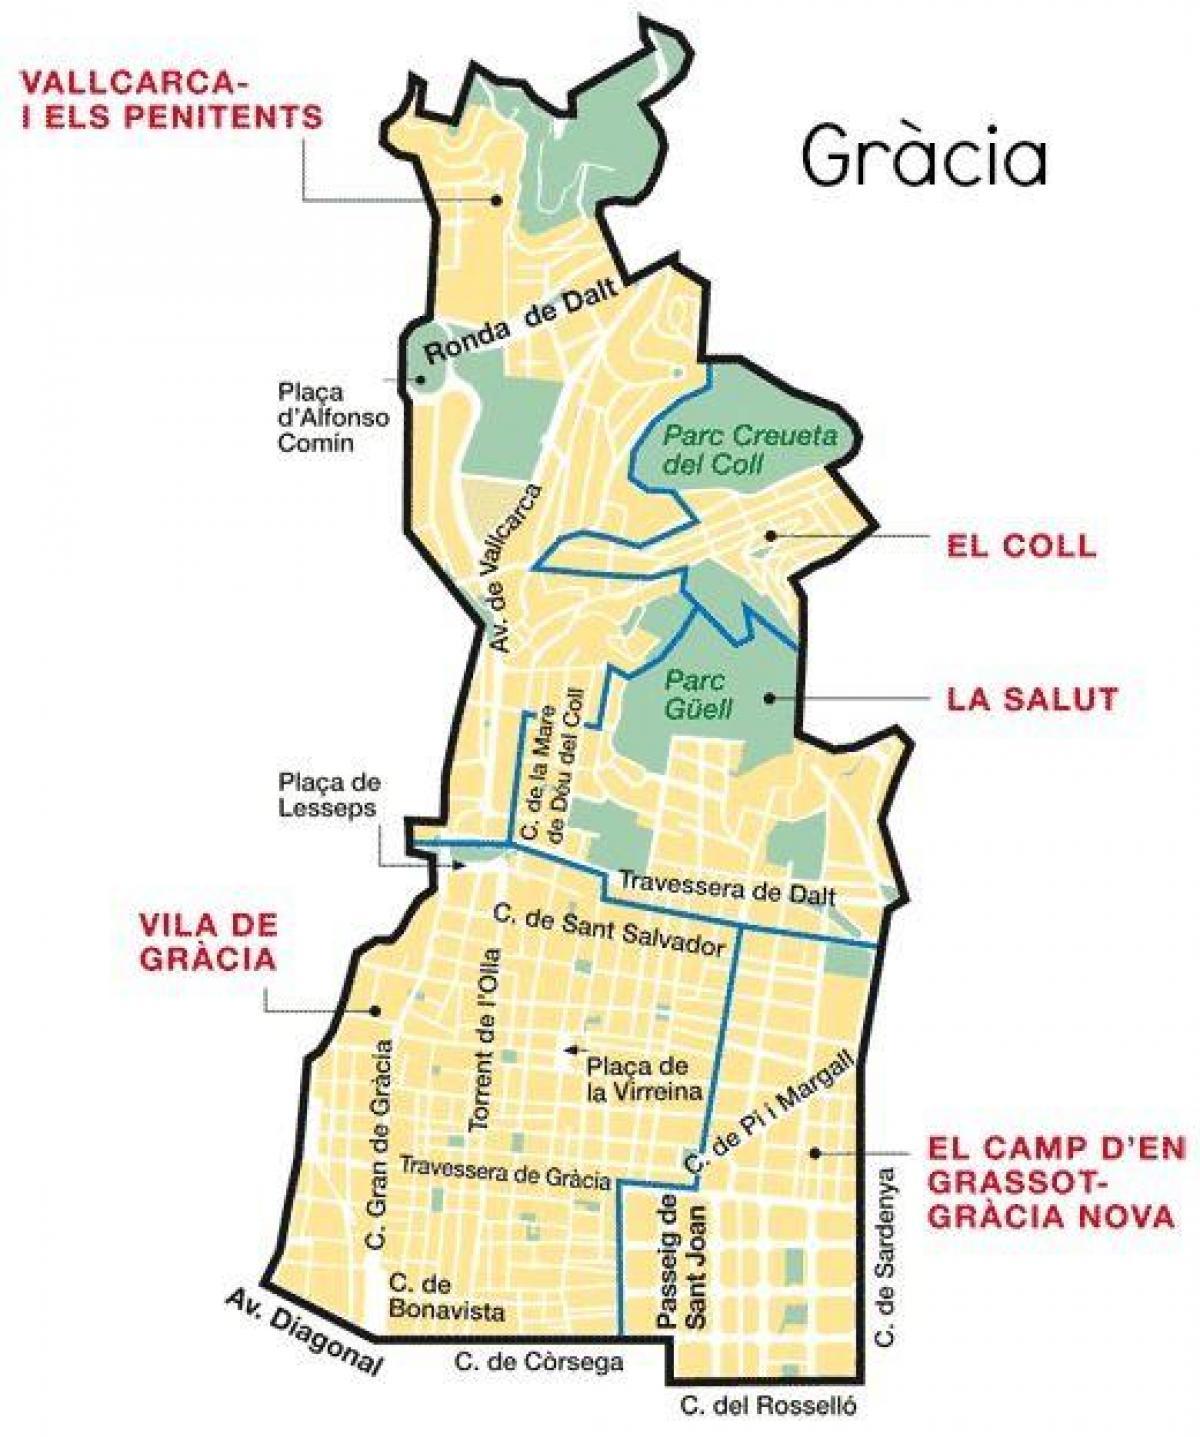 Gracia Barcelona Kartta Kartta Gracia Barcelonassa Katalonia